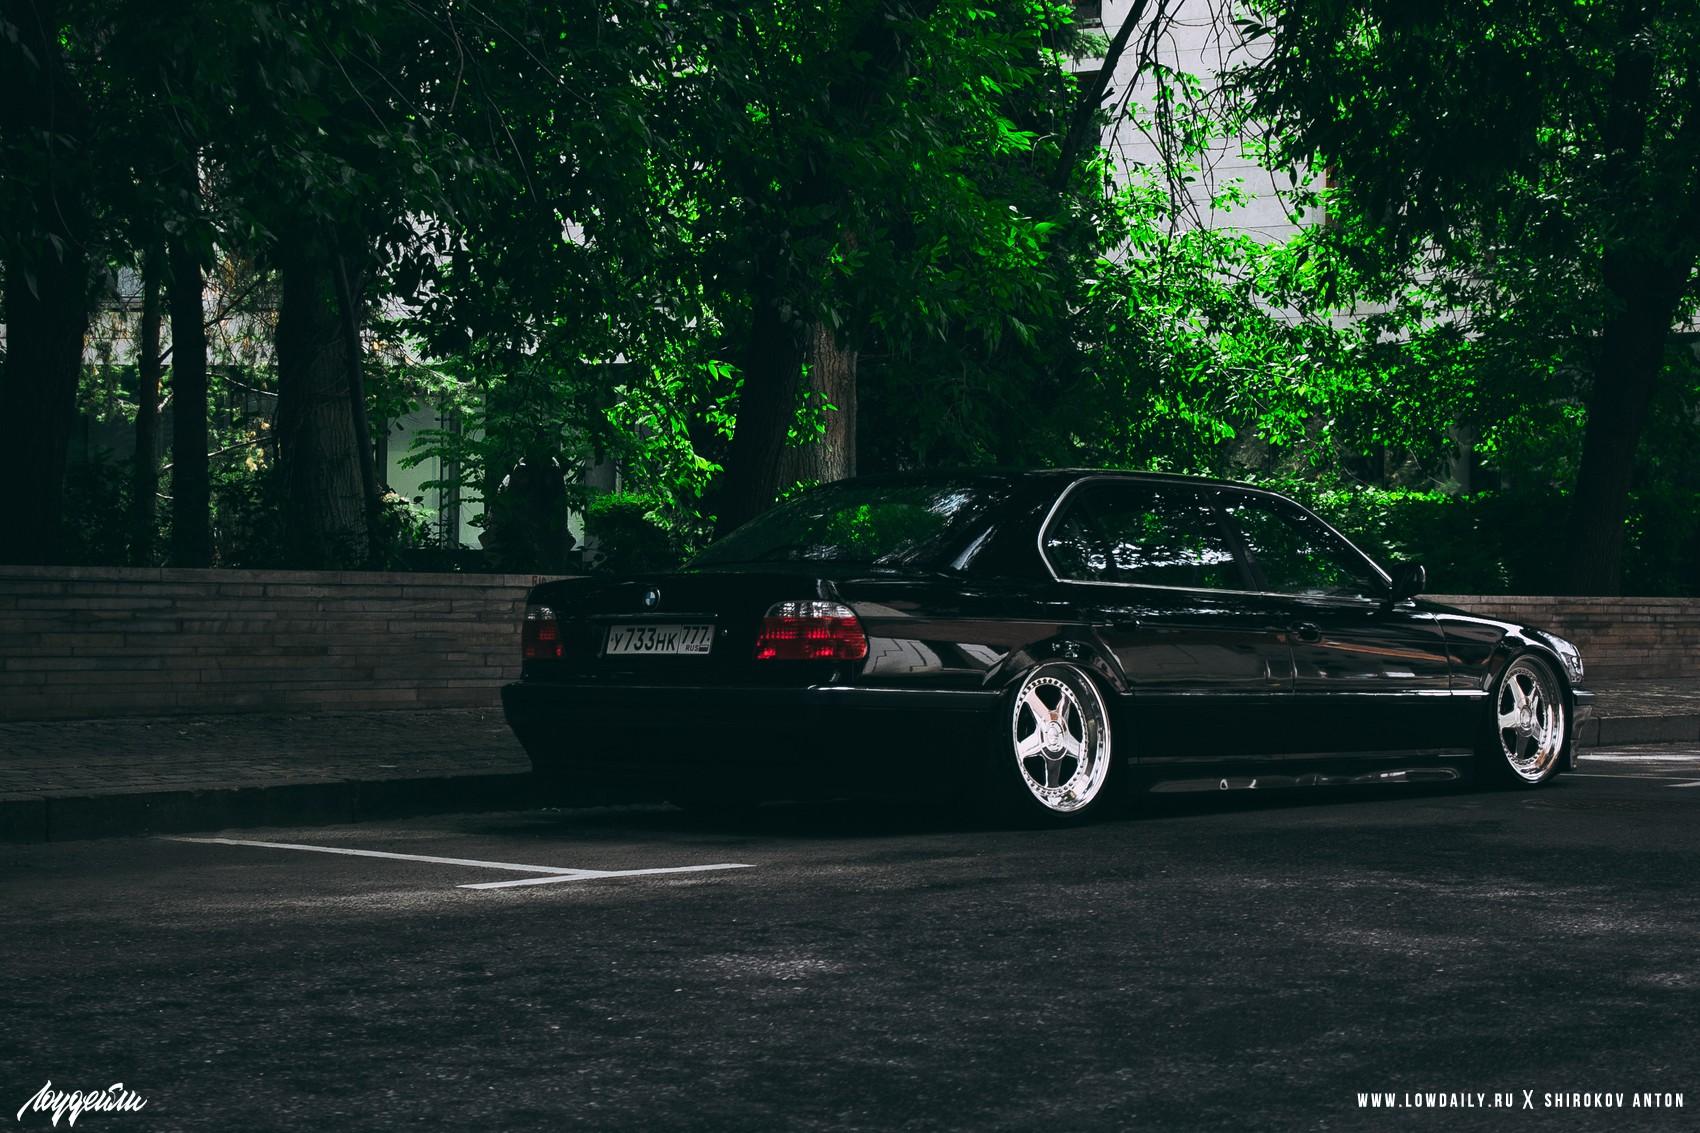 BMW E38 Lowdaily _MG_7098